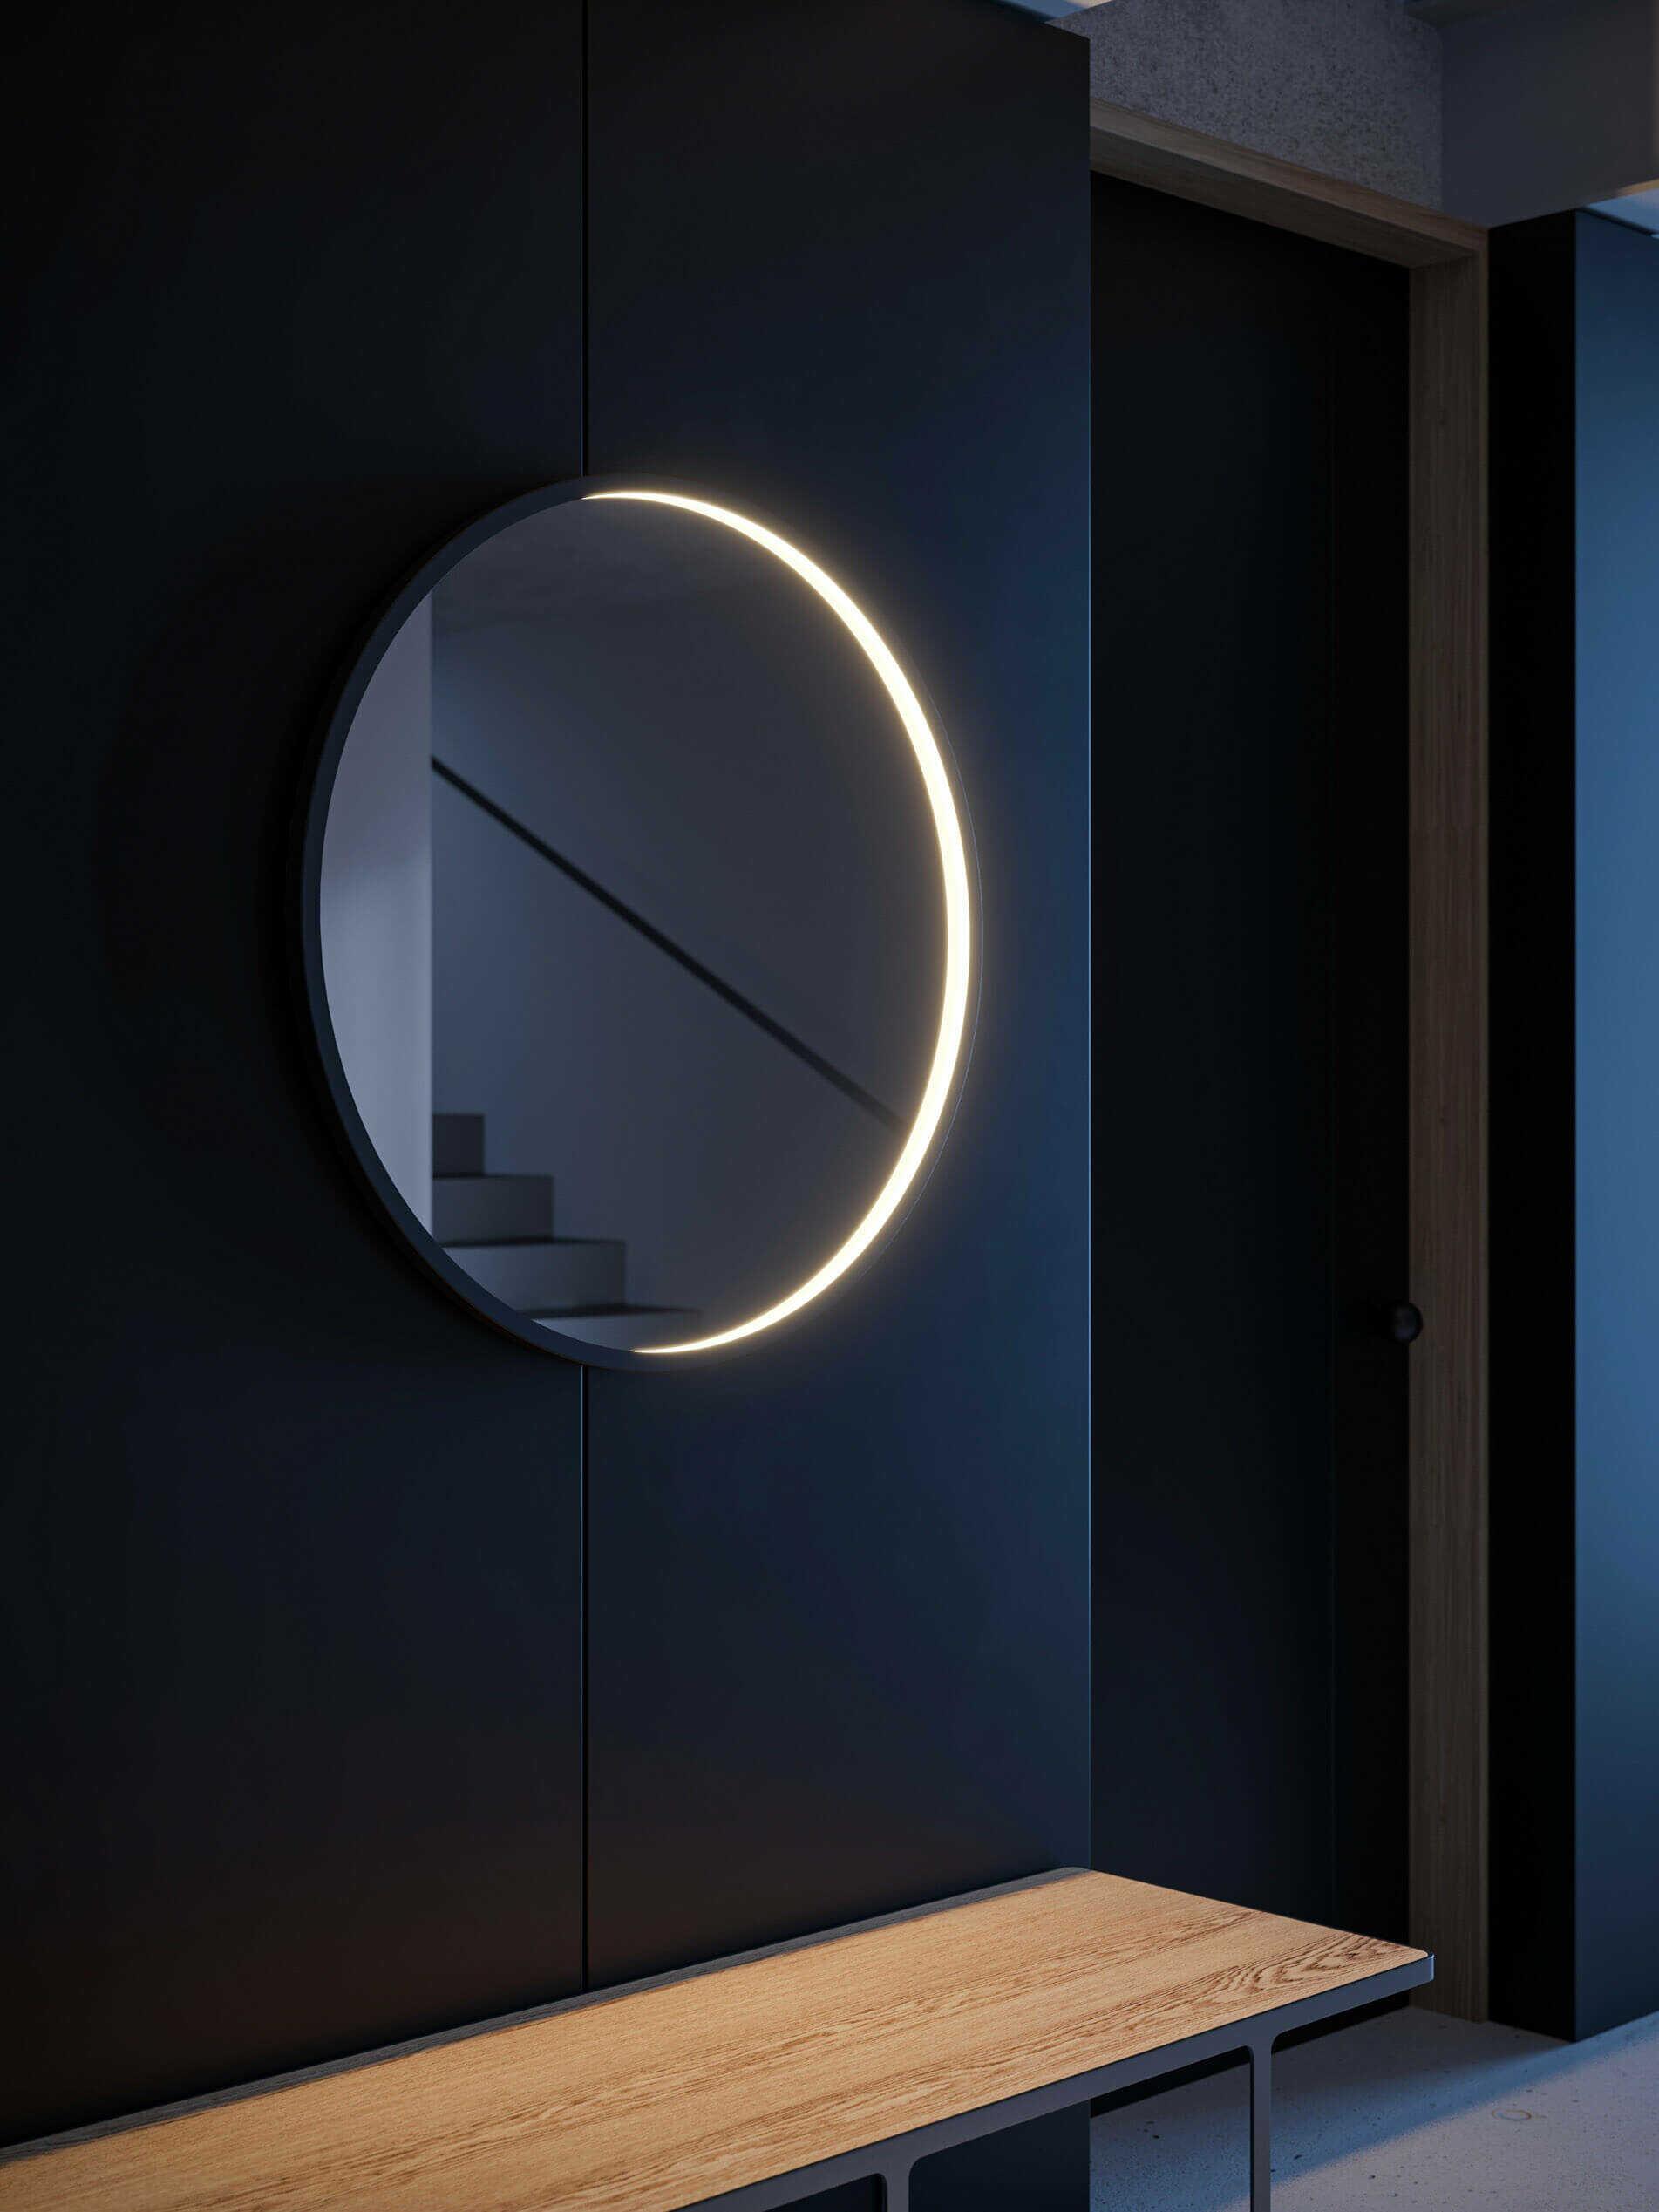 Rund Futon Mirror fra Intra Lighting i gang